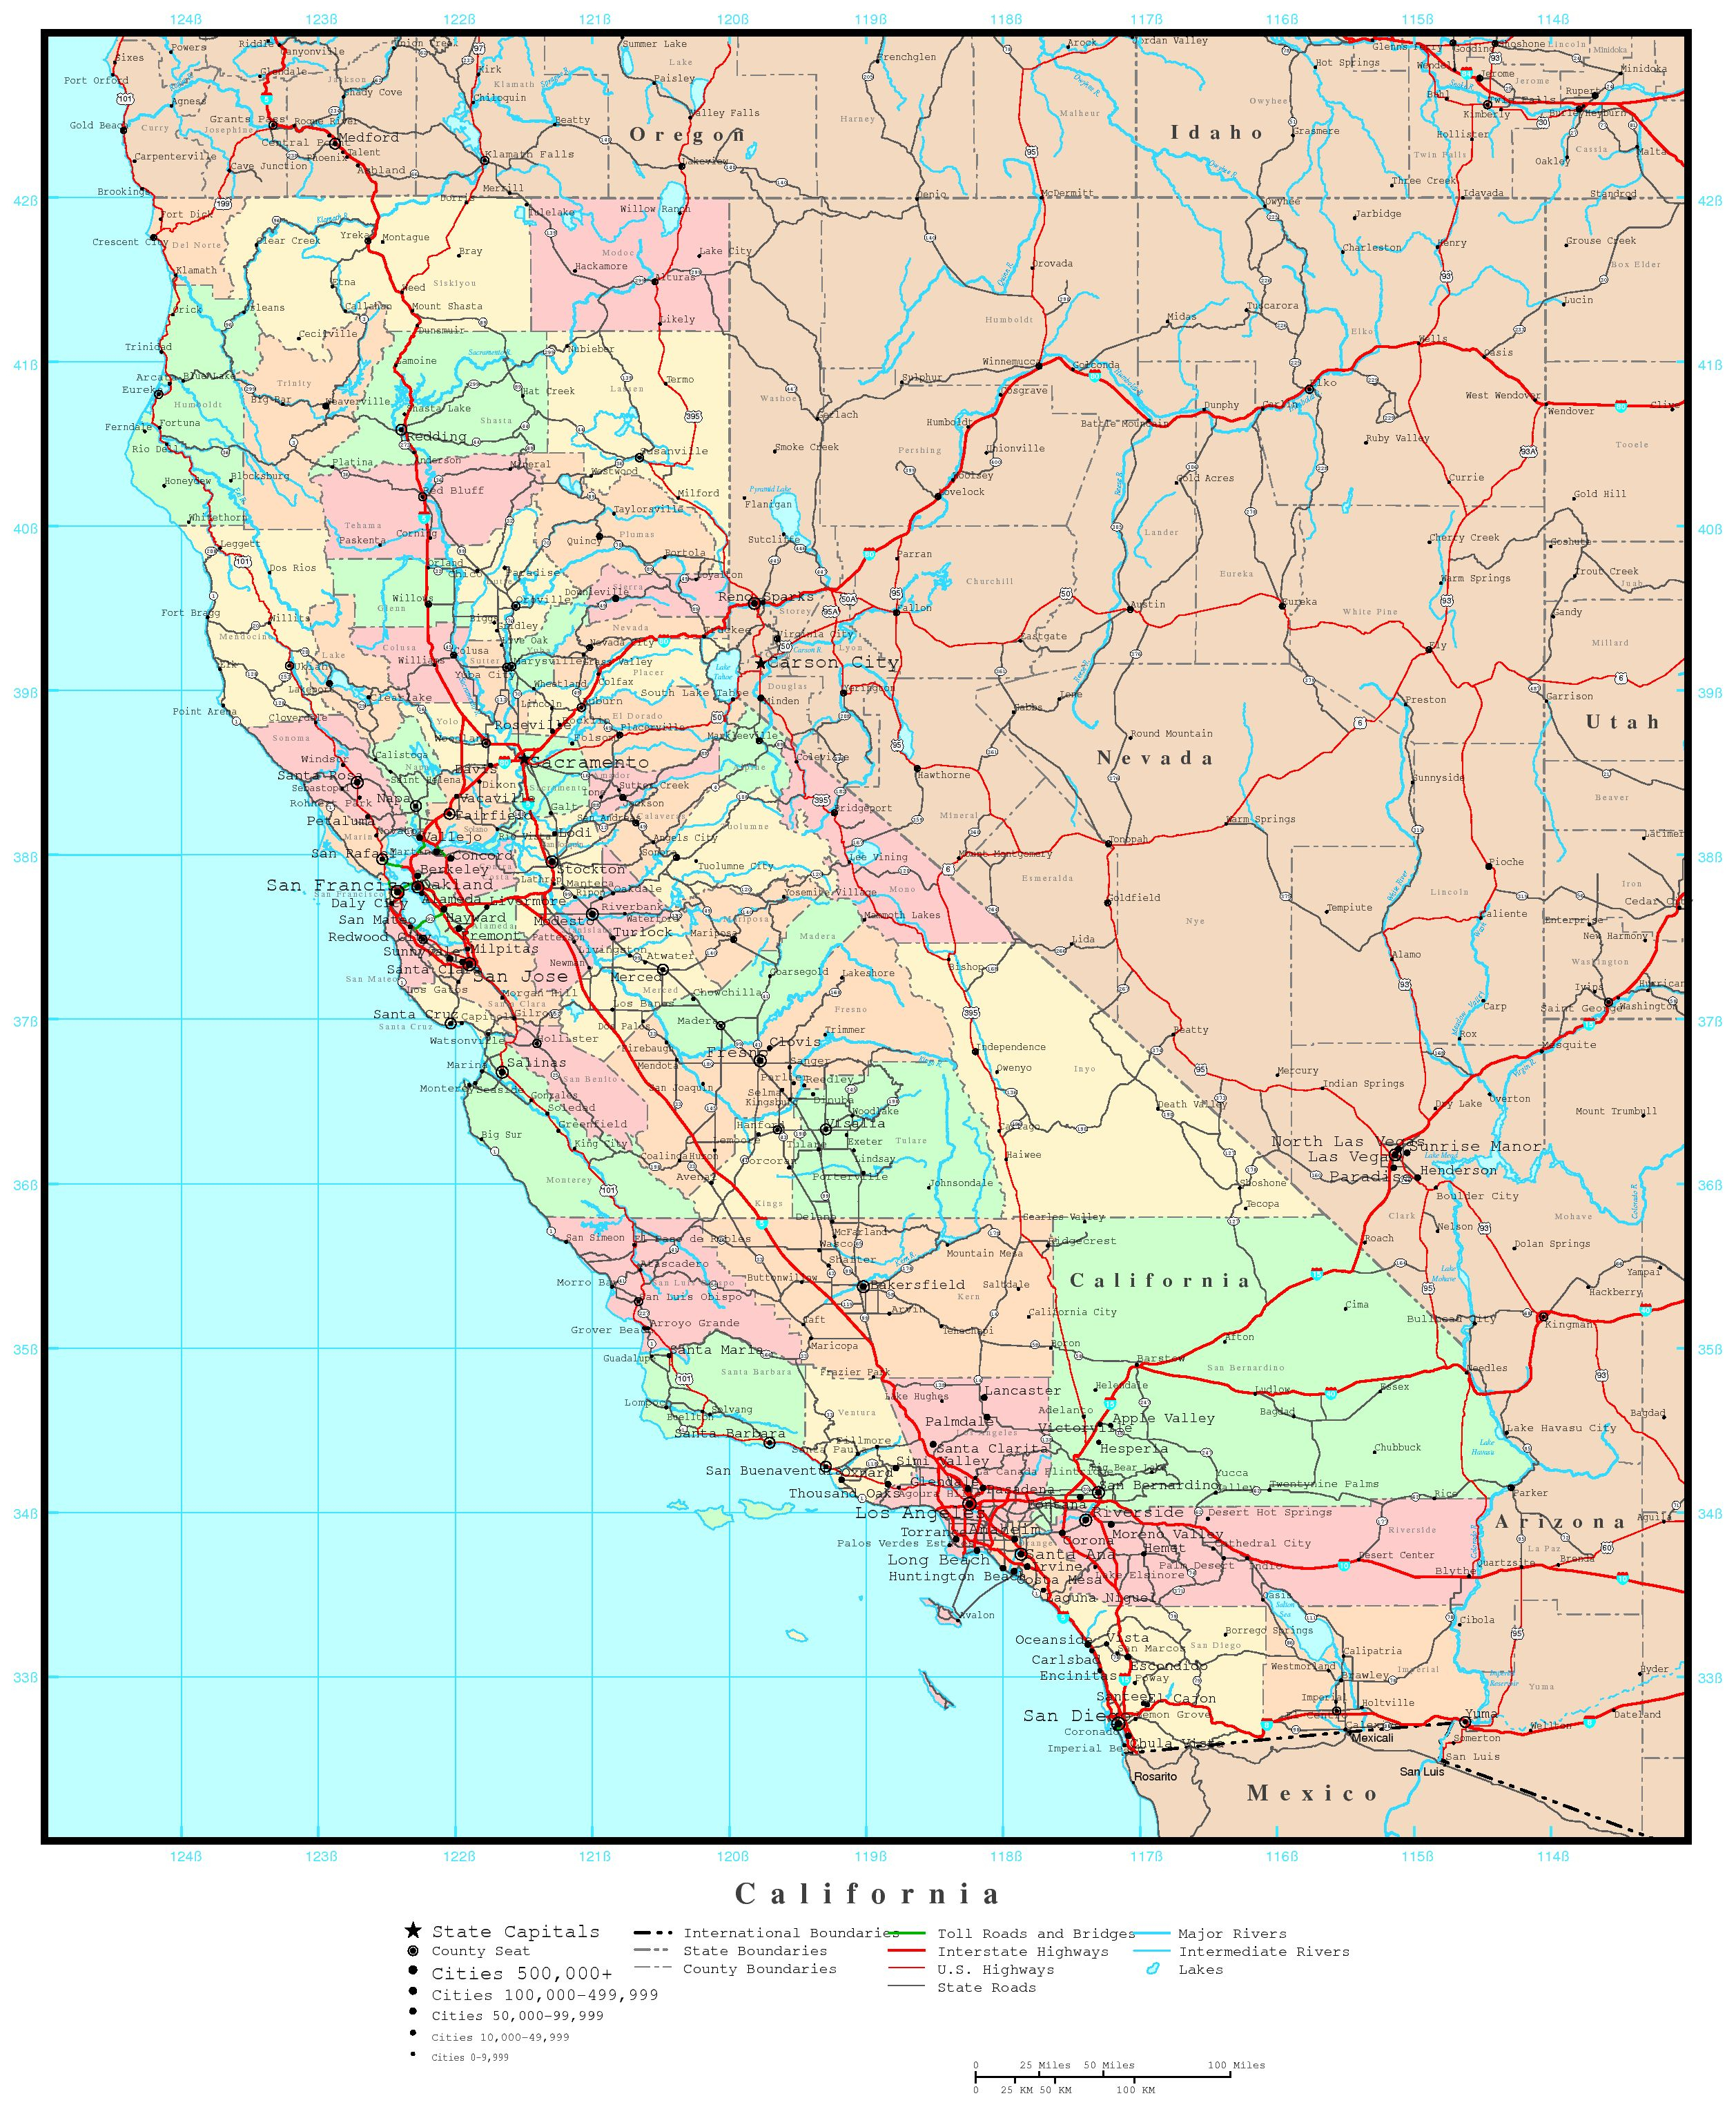 California County Map Interactive - Klipy - Interactive Map Of California Counties